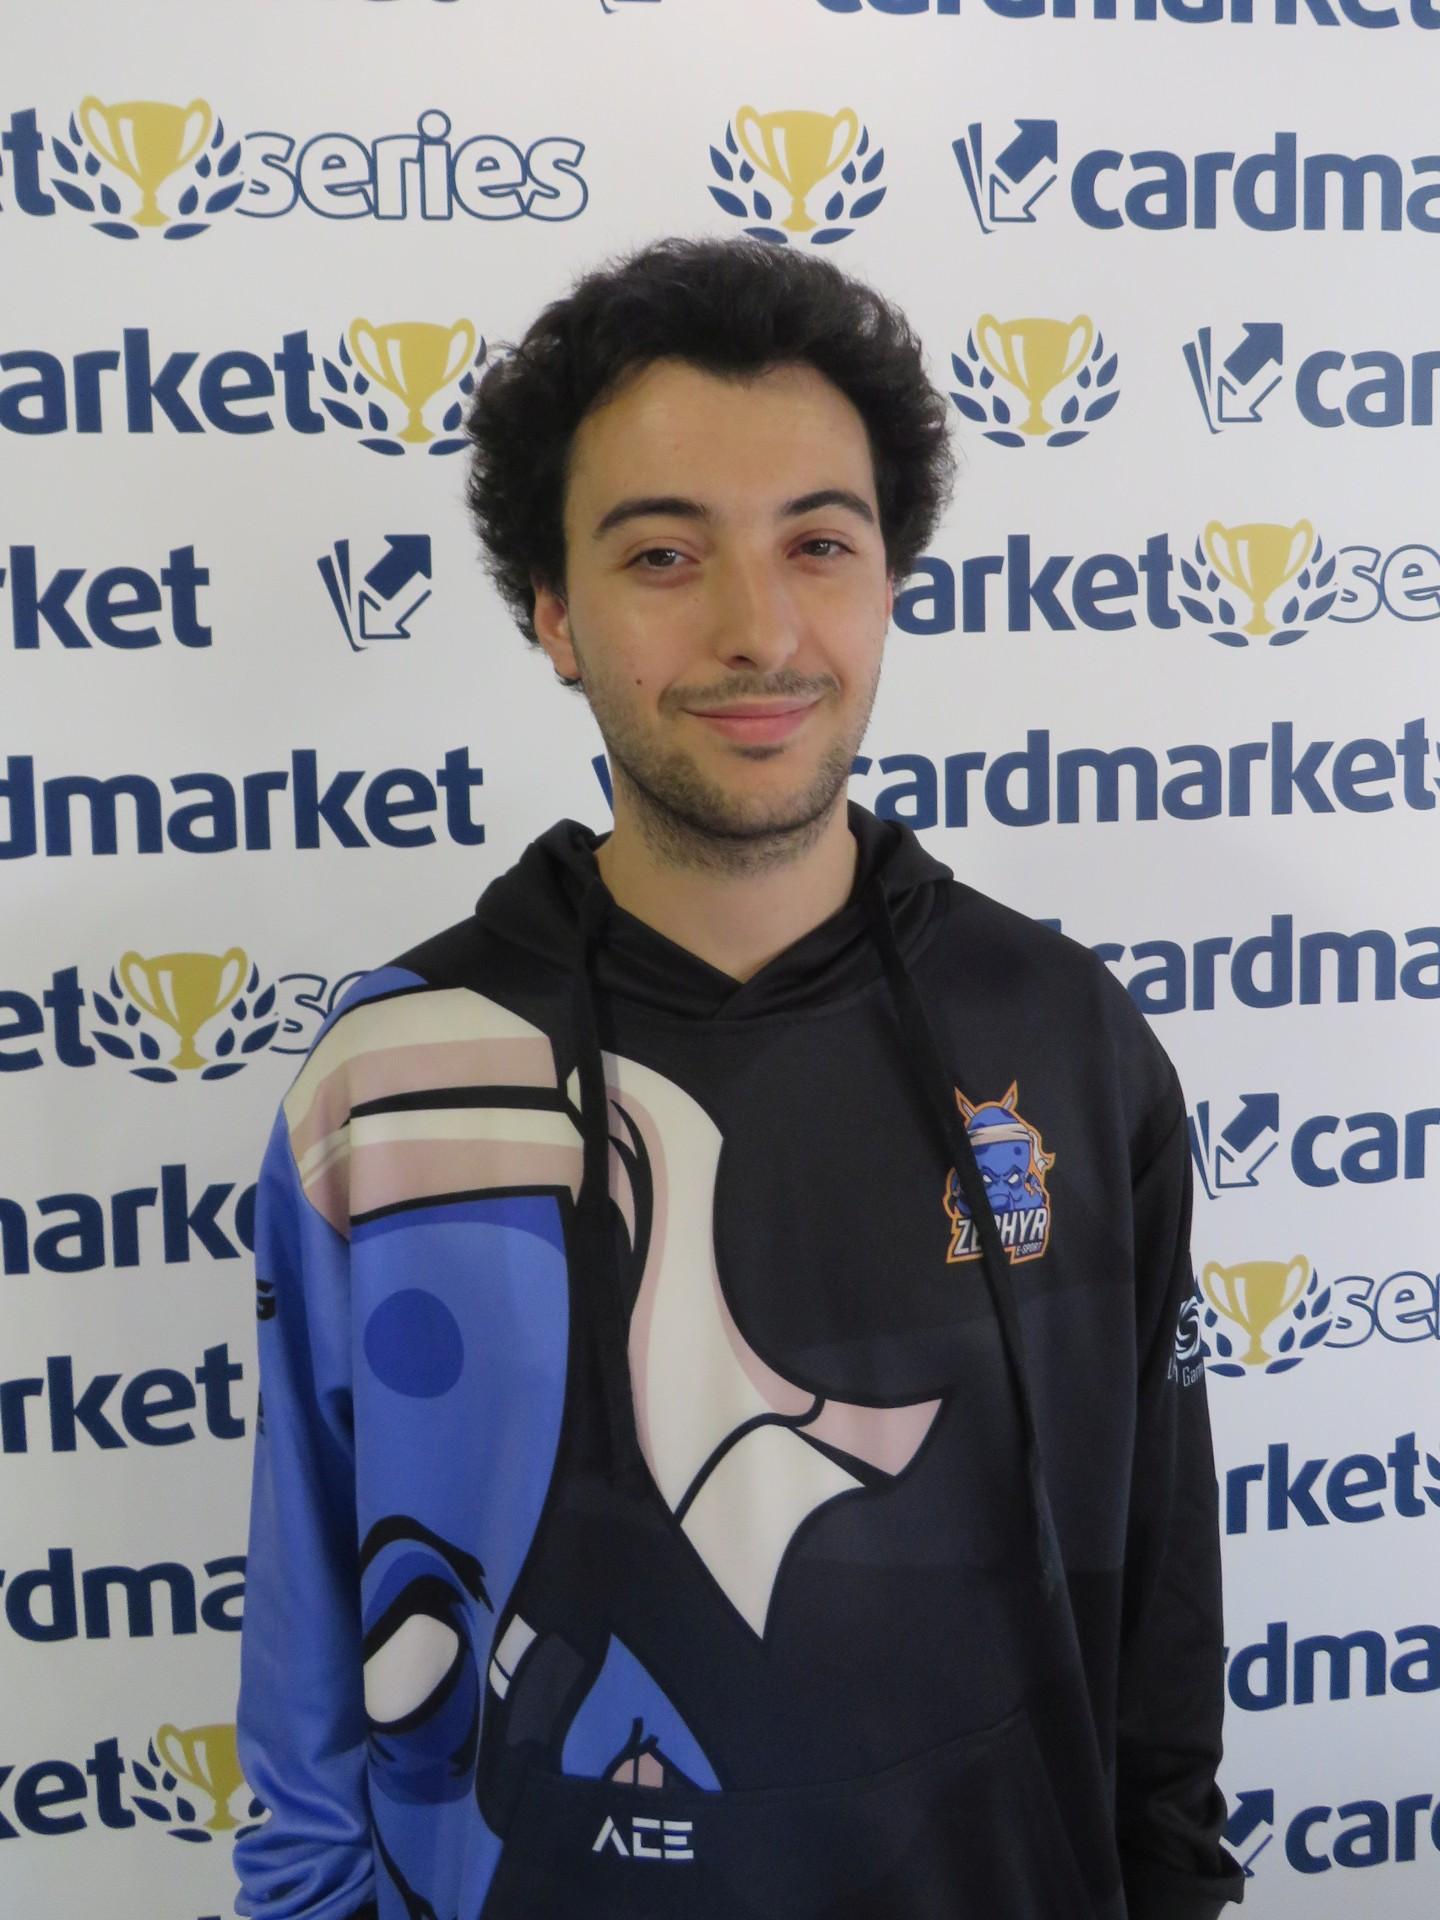 Maxime Pernin